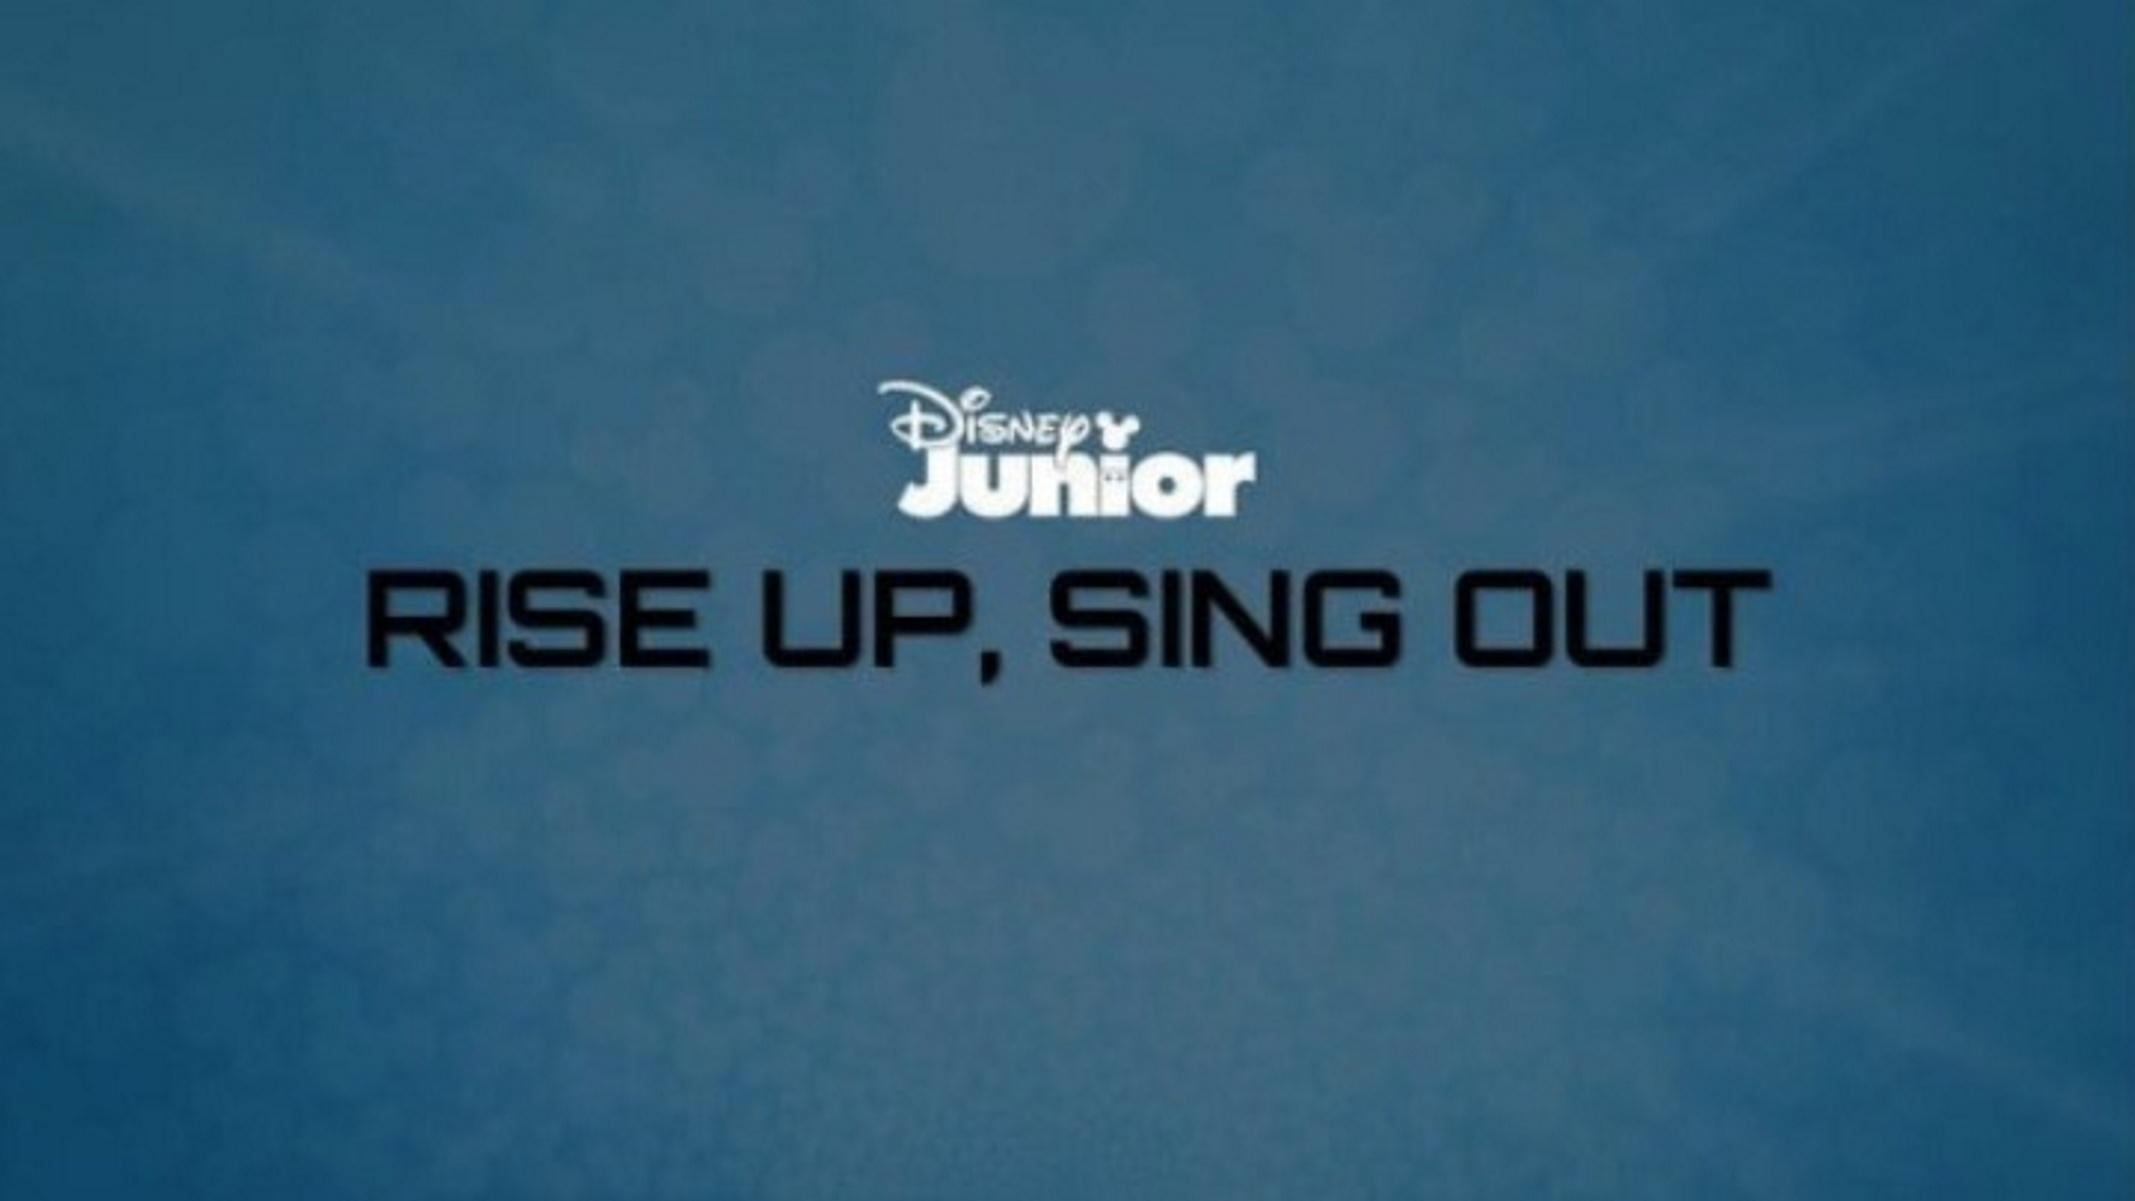 Disney Junior: Η νέα σειρά του ανοίγει την κουβέντα για τον ρατσισμό